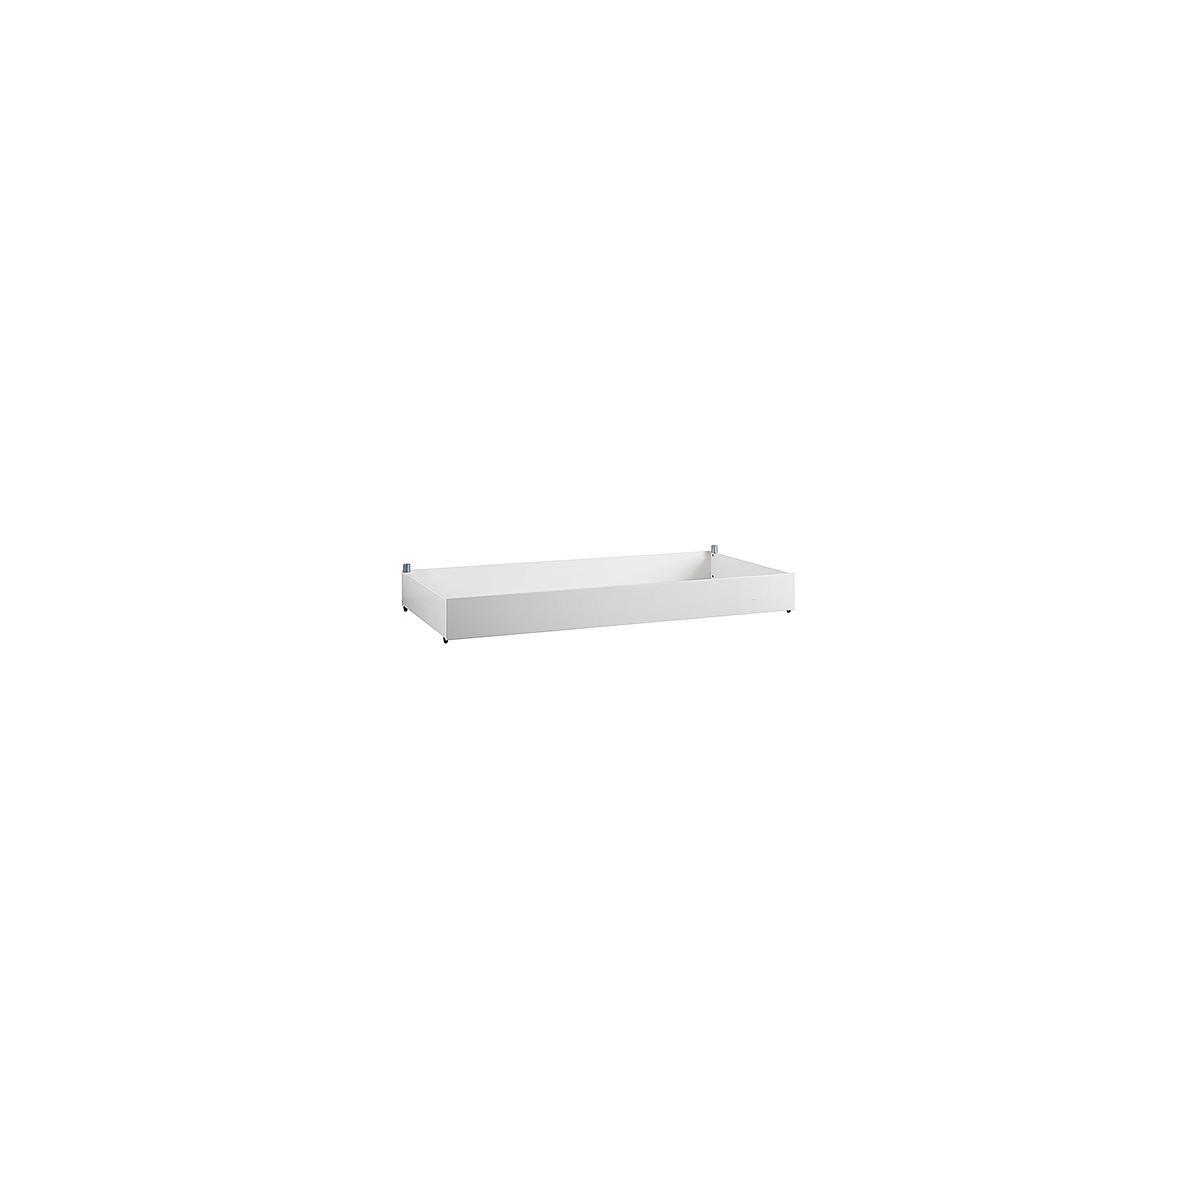 Cajón cama 90x200cm Lifetime blancoo